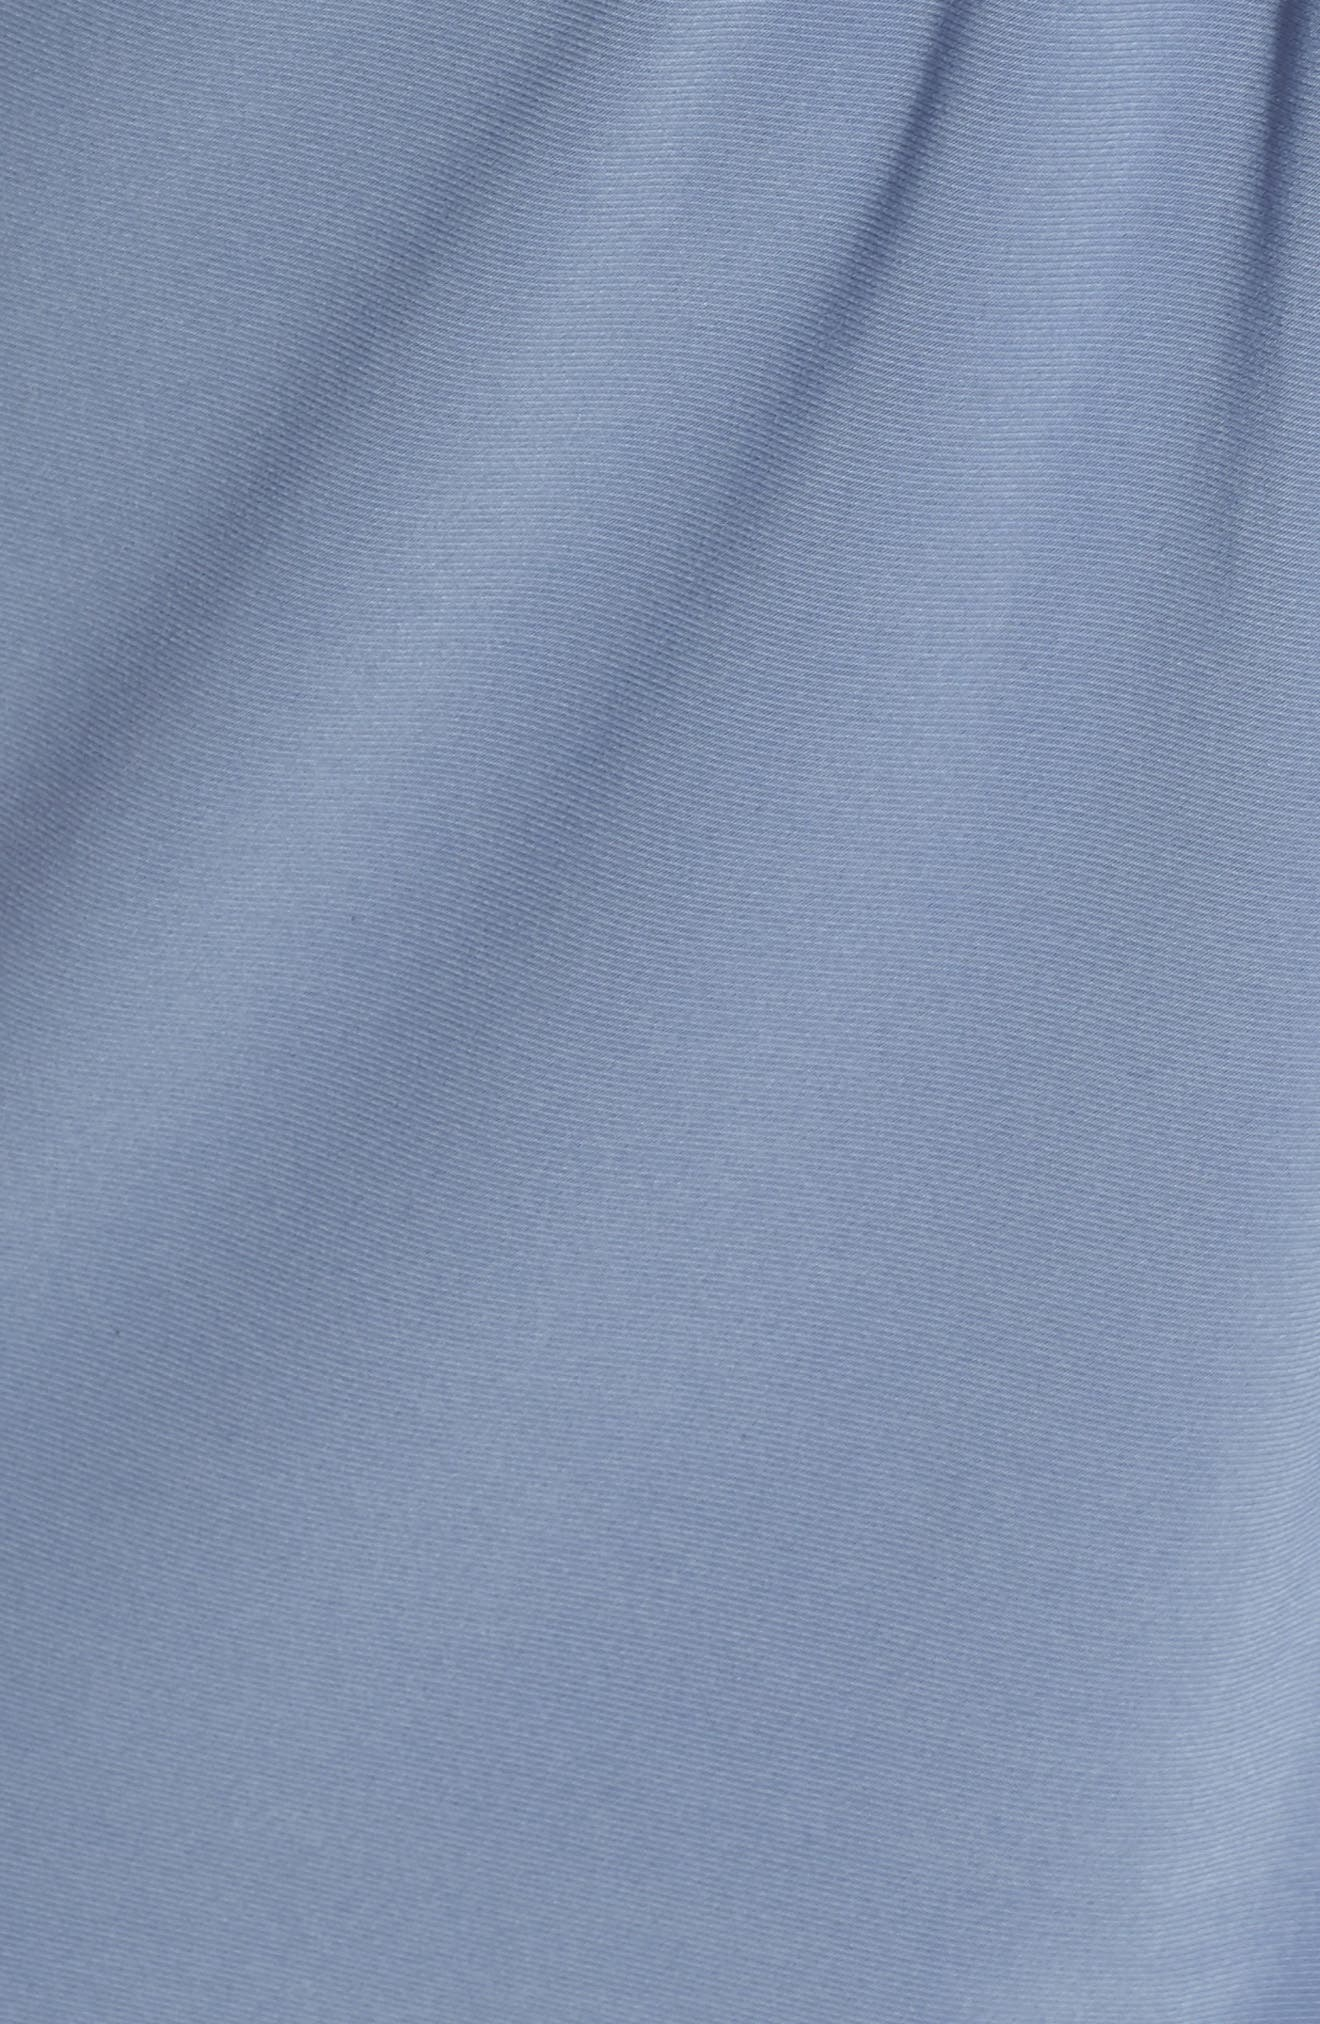 Knot Front Mixed Media Sheath Dress,                             Alternate thumbnail 6, color,